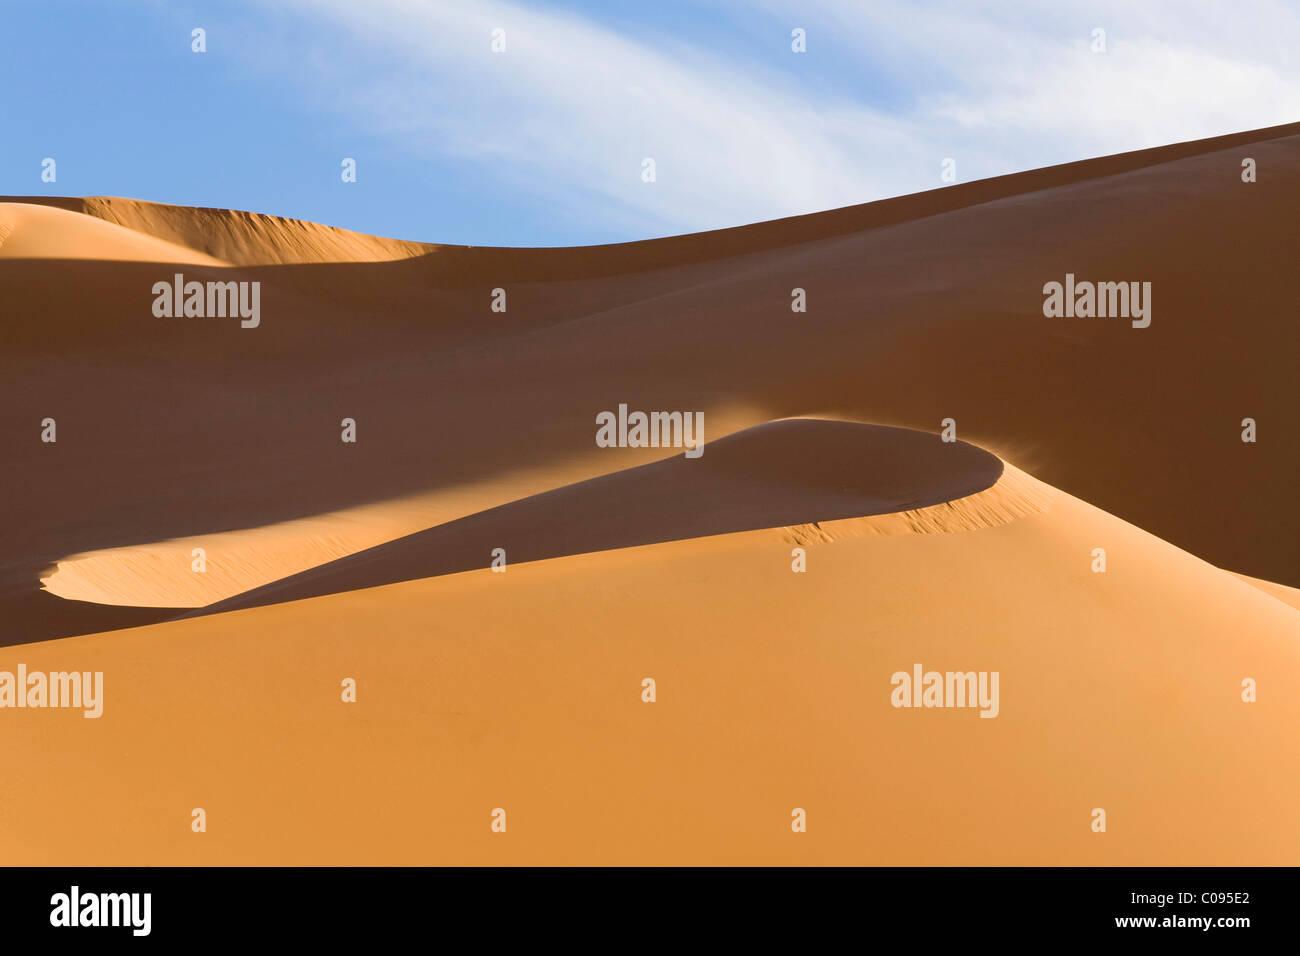 Sand dunes of the Libyan desert, Erg Murzuq, Libya, Sahara, North Africa, Africa - Stock Image